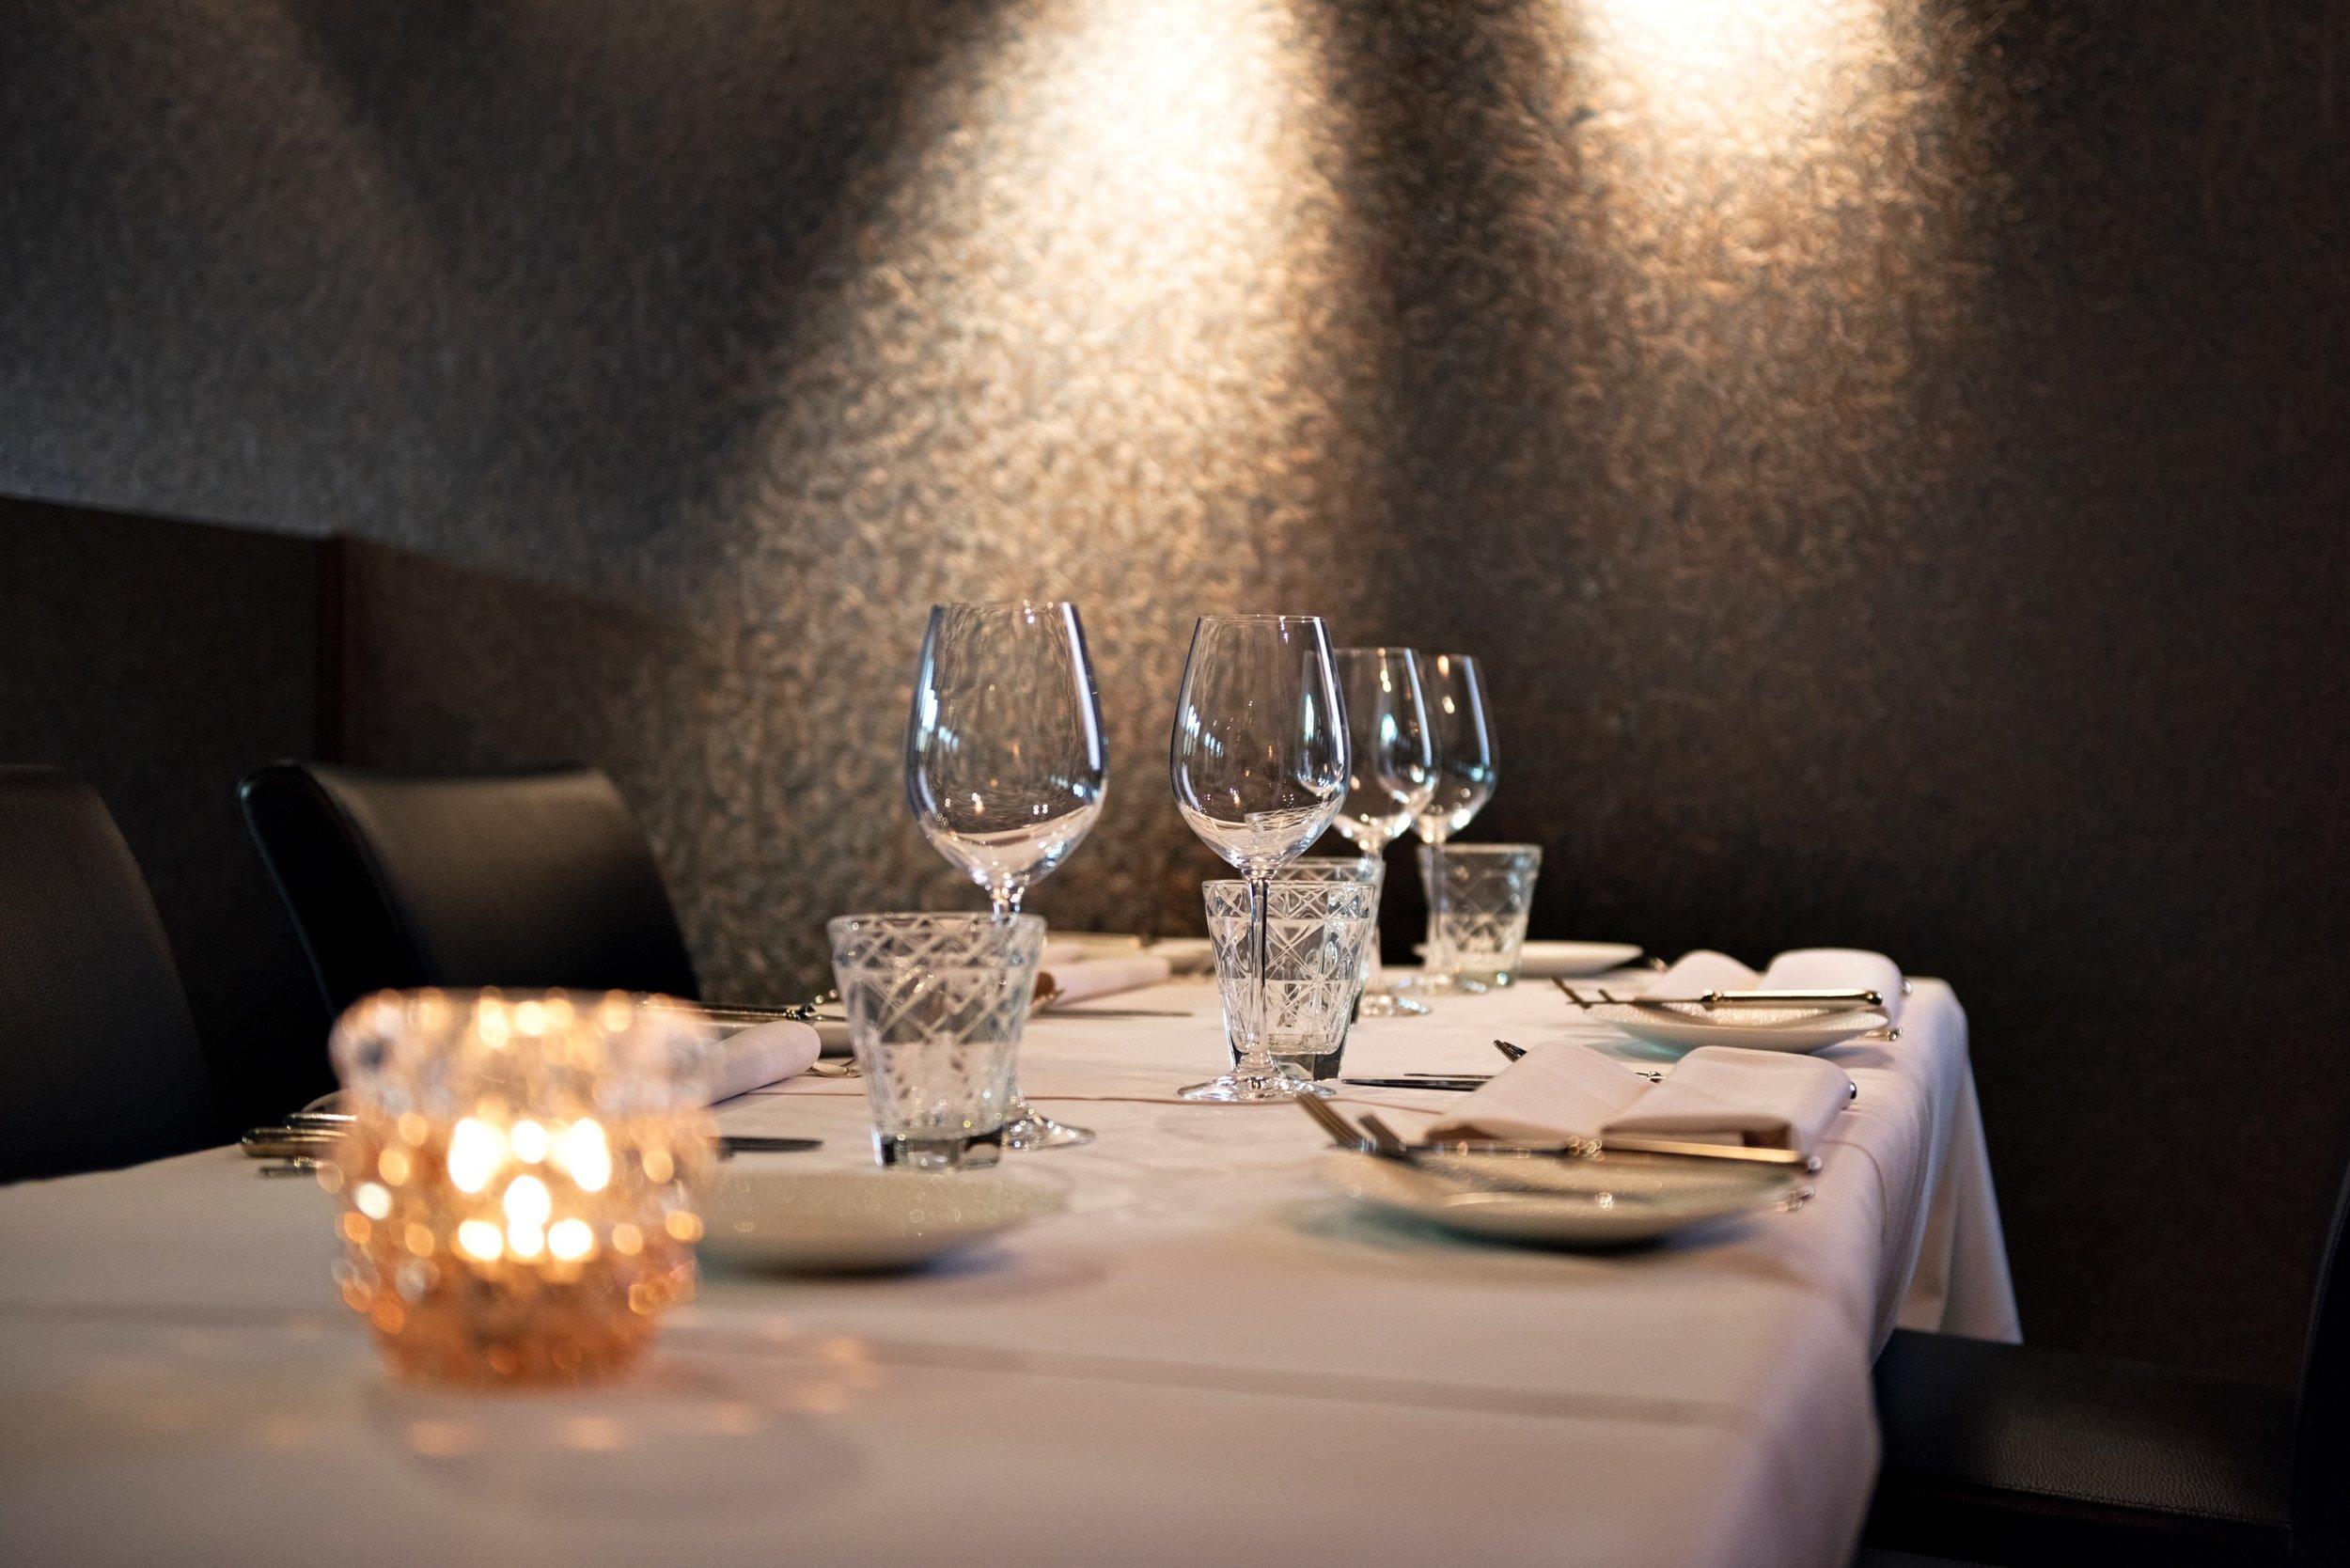 11 michelin restaurant the glorious antwerpen tablefever bart albrecht.jpg